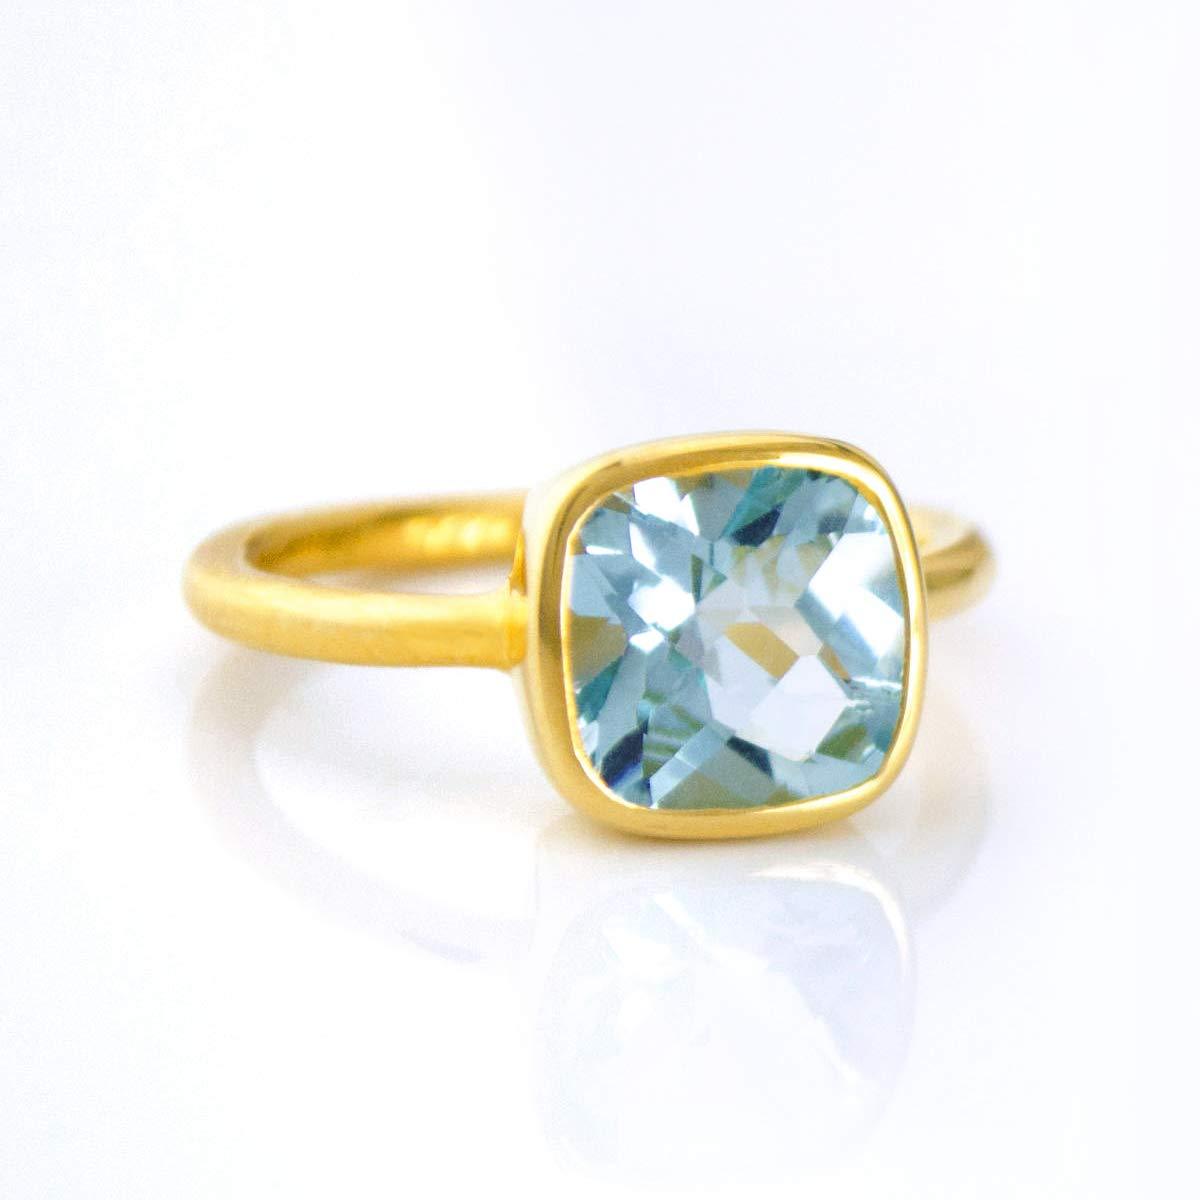 Blue Topaz Cushion Ring, Vermeil Gold or Sterling Silver, December Birthstone Ring